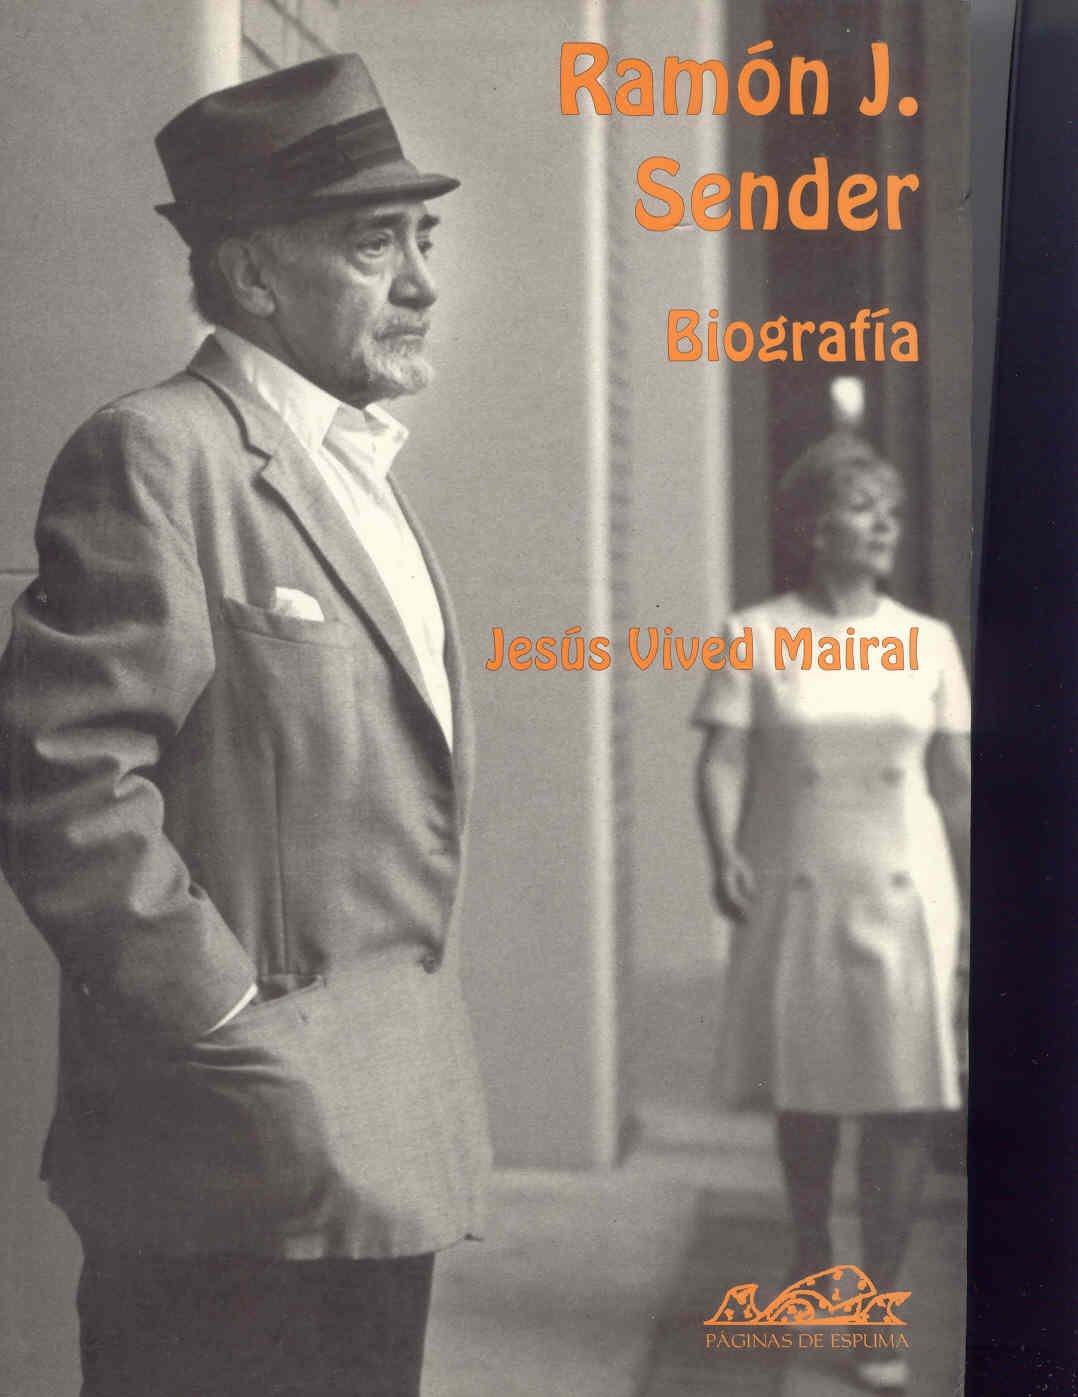 Biografía de Sender por Vived